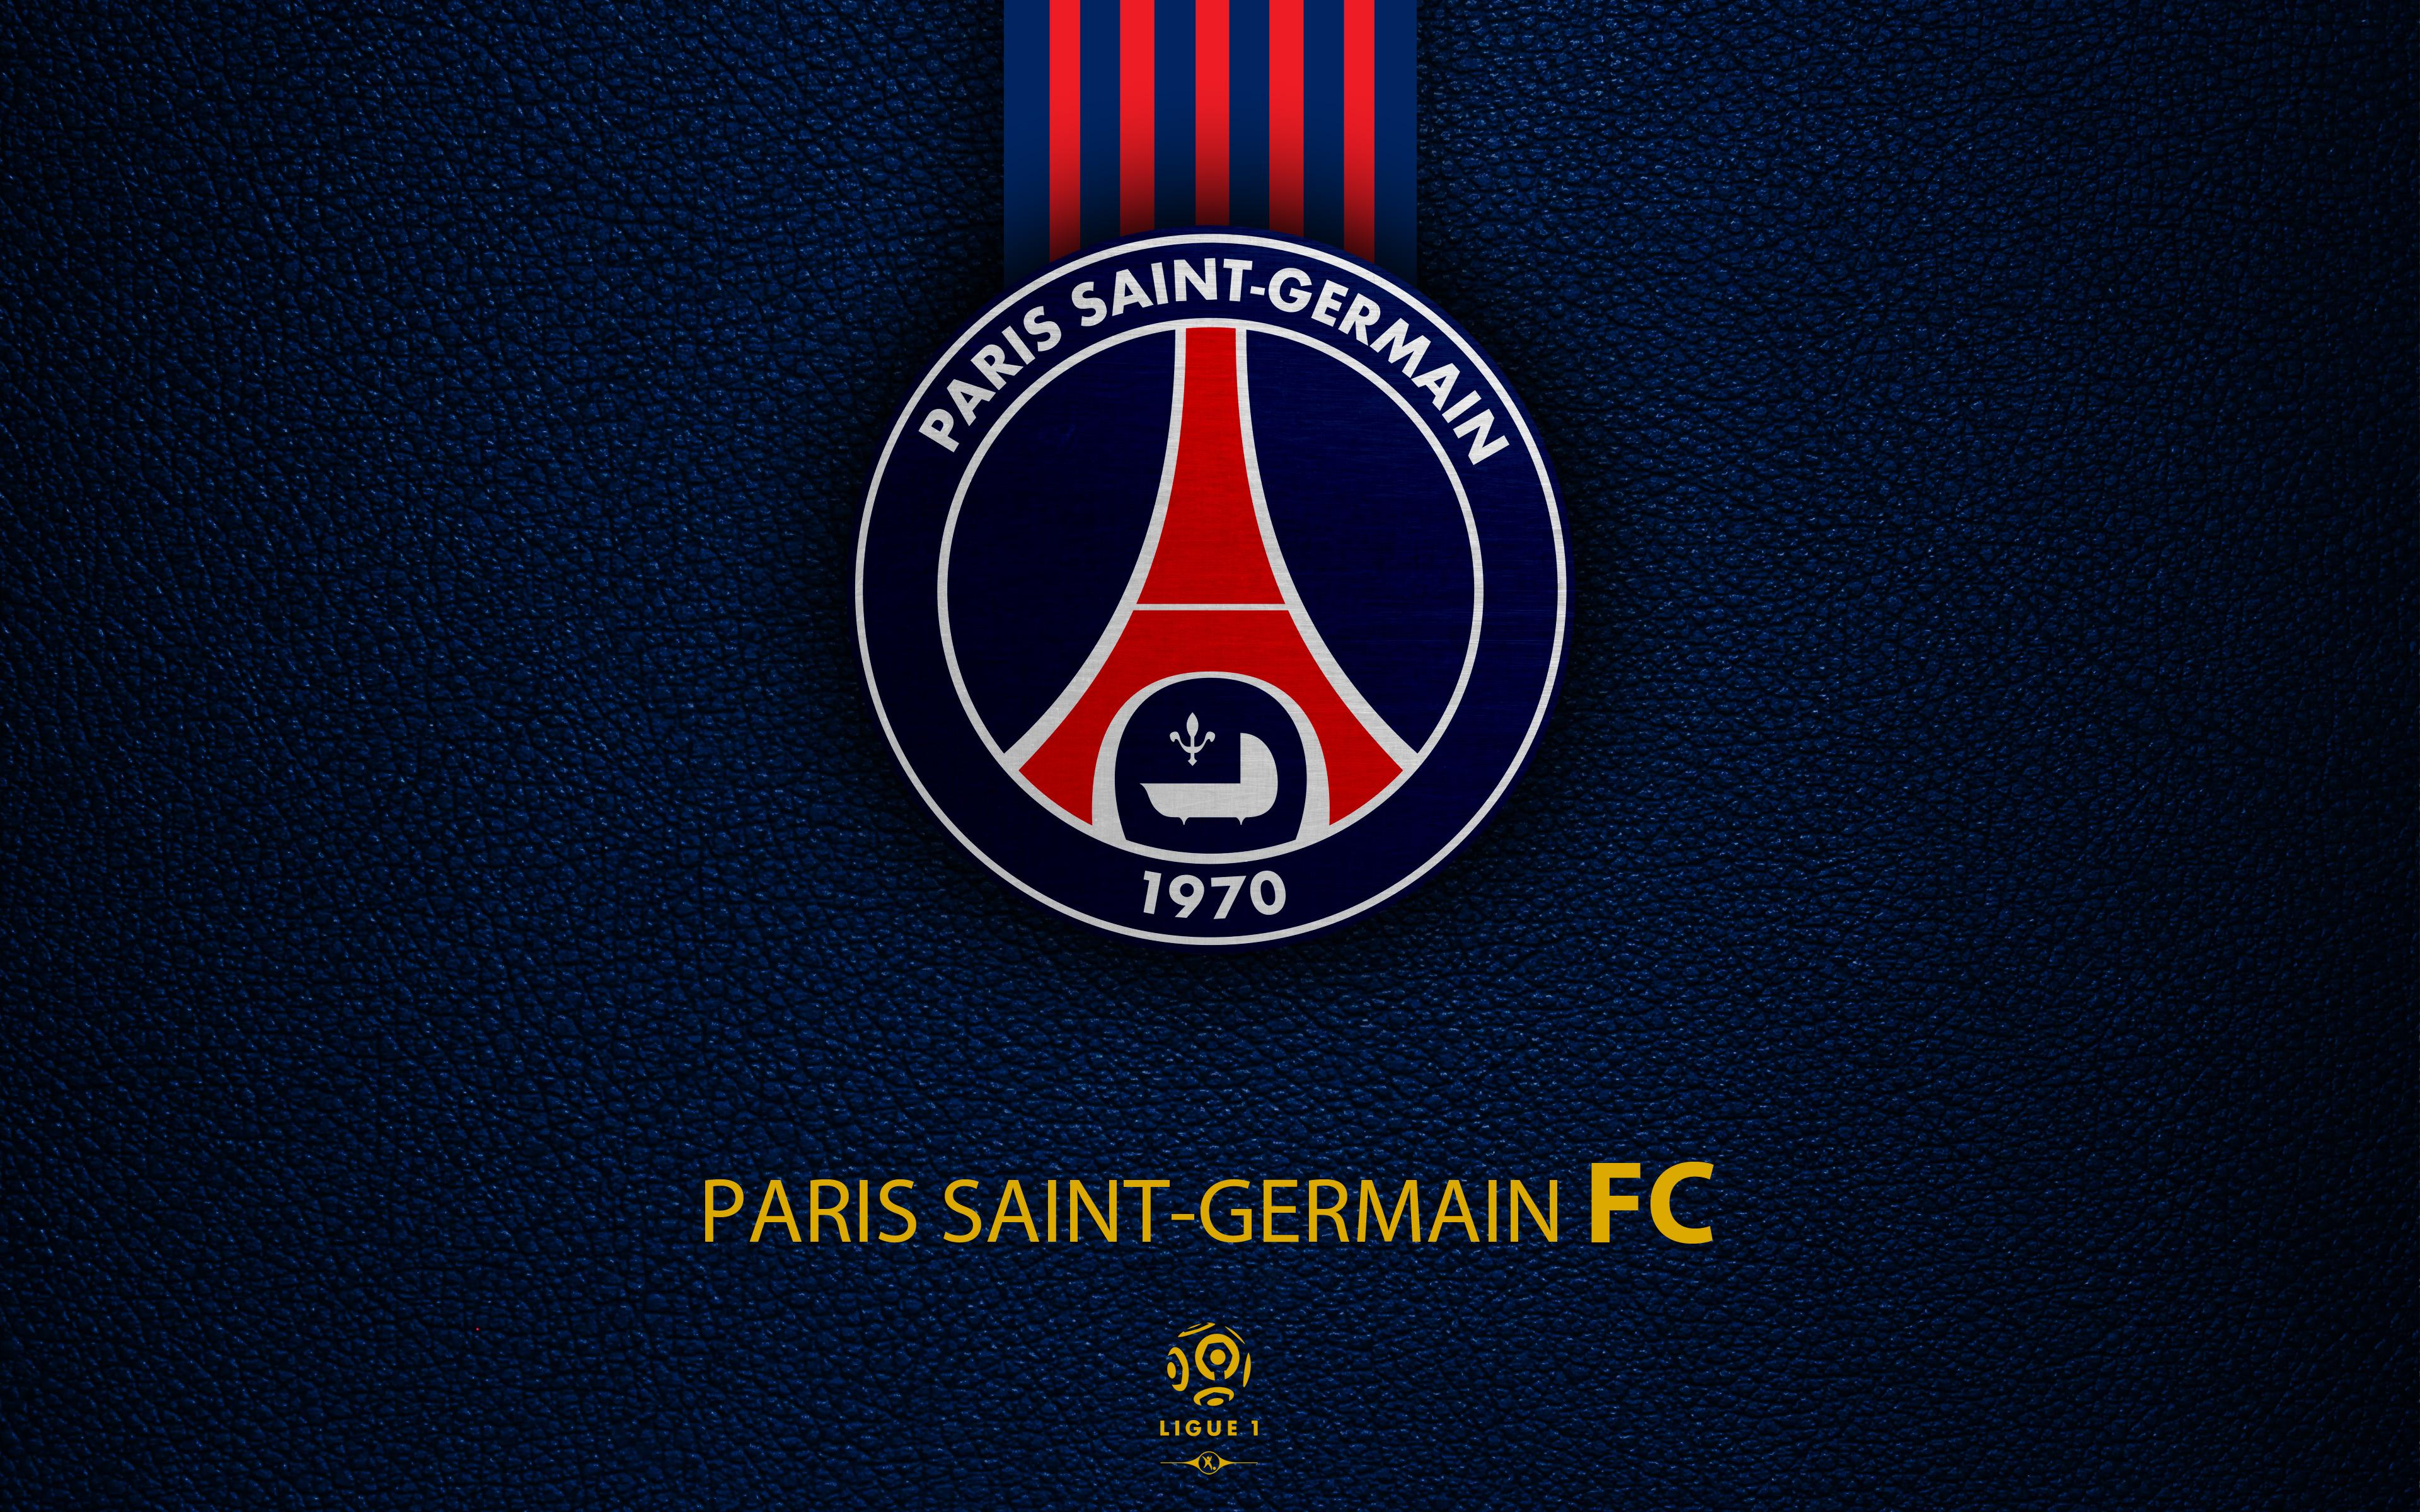 970408 Title Psg Logo Sports Paris Saint Germain Football Club Paris Saint Germain 3840x2400 Download Hd Wallpaper Wallpapertip